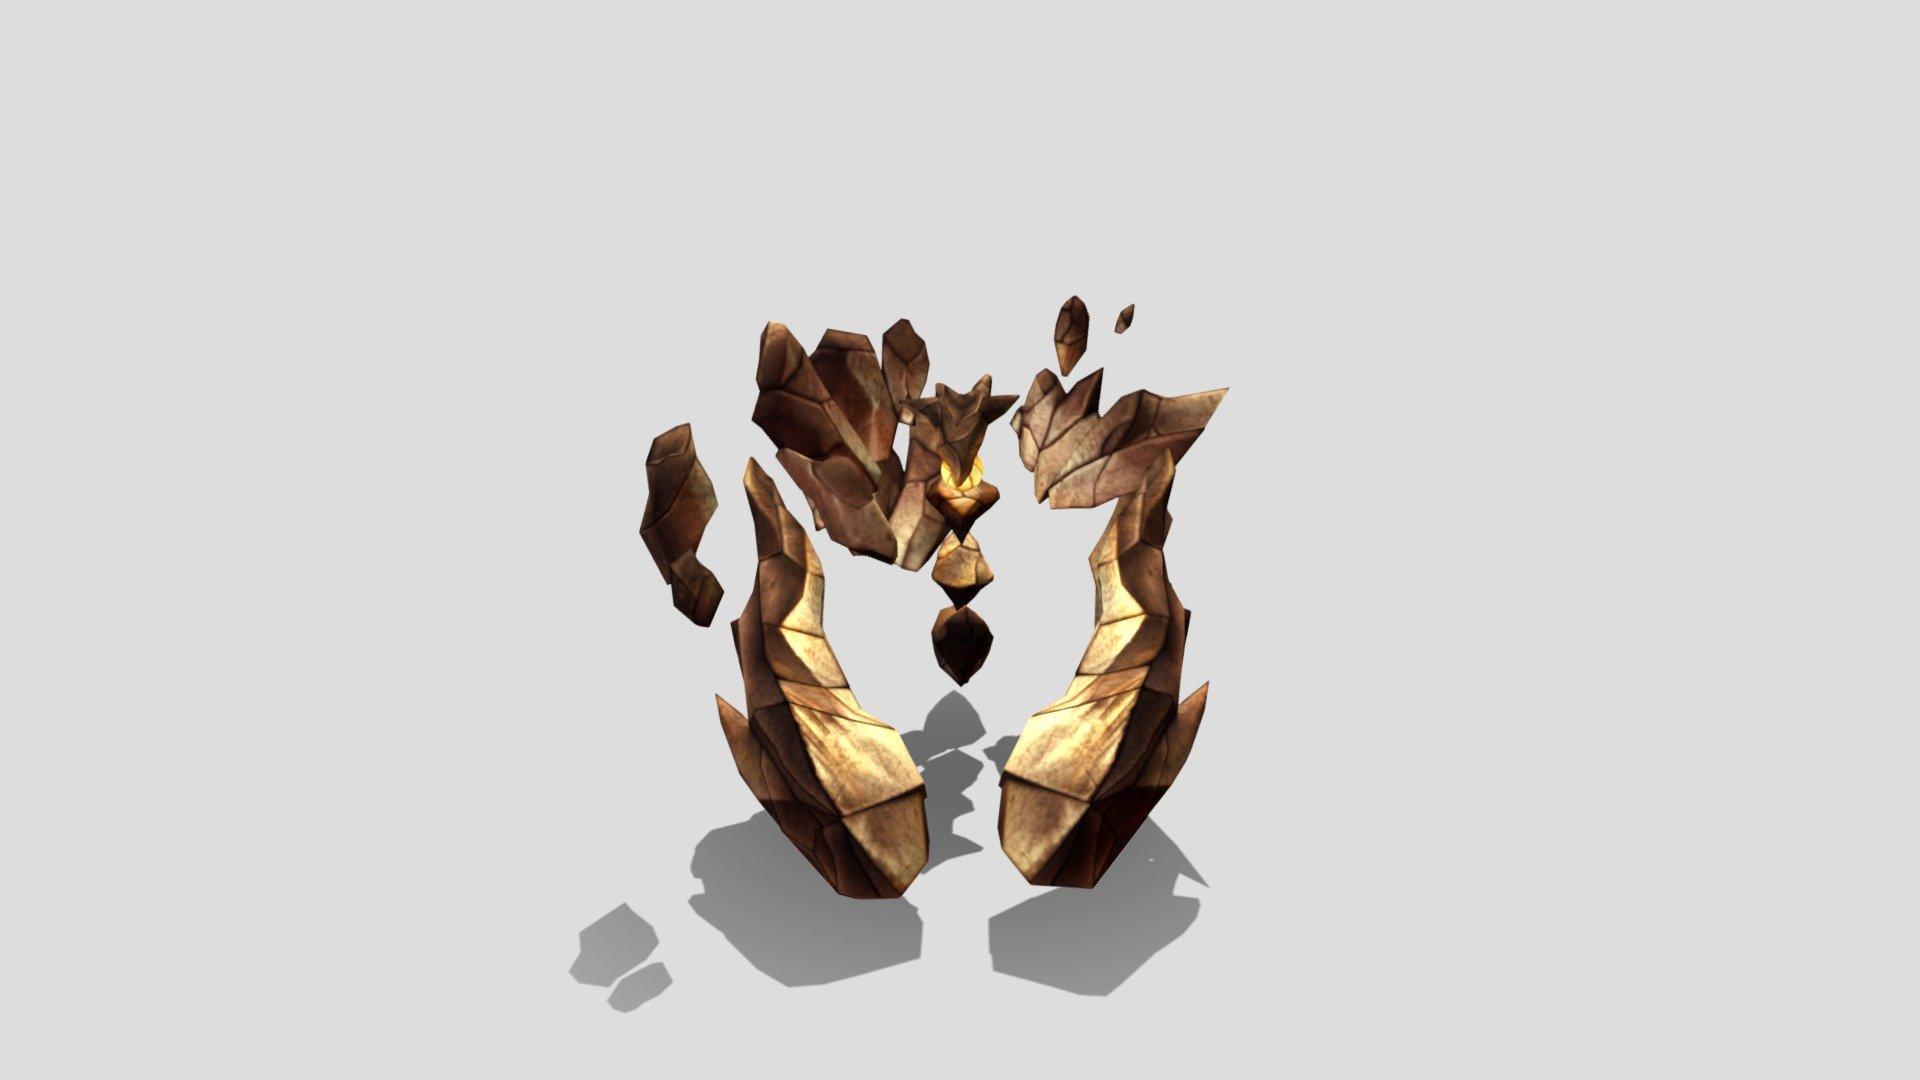 Stone Elemental - 3D model by TAKATUGU (@TAKATUGU) [051724f]